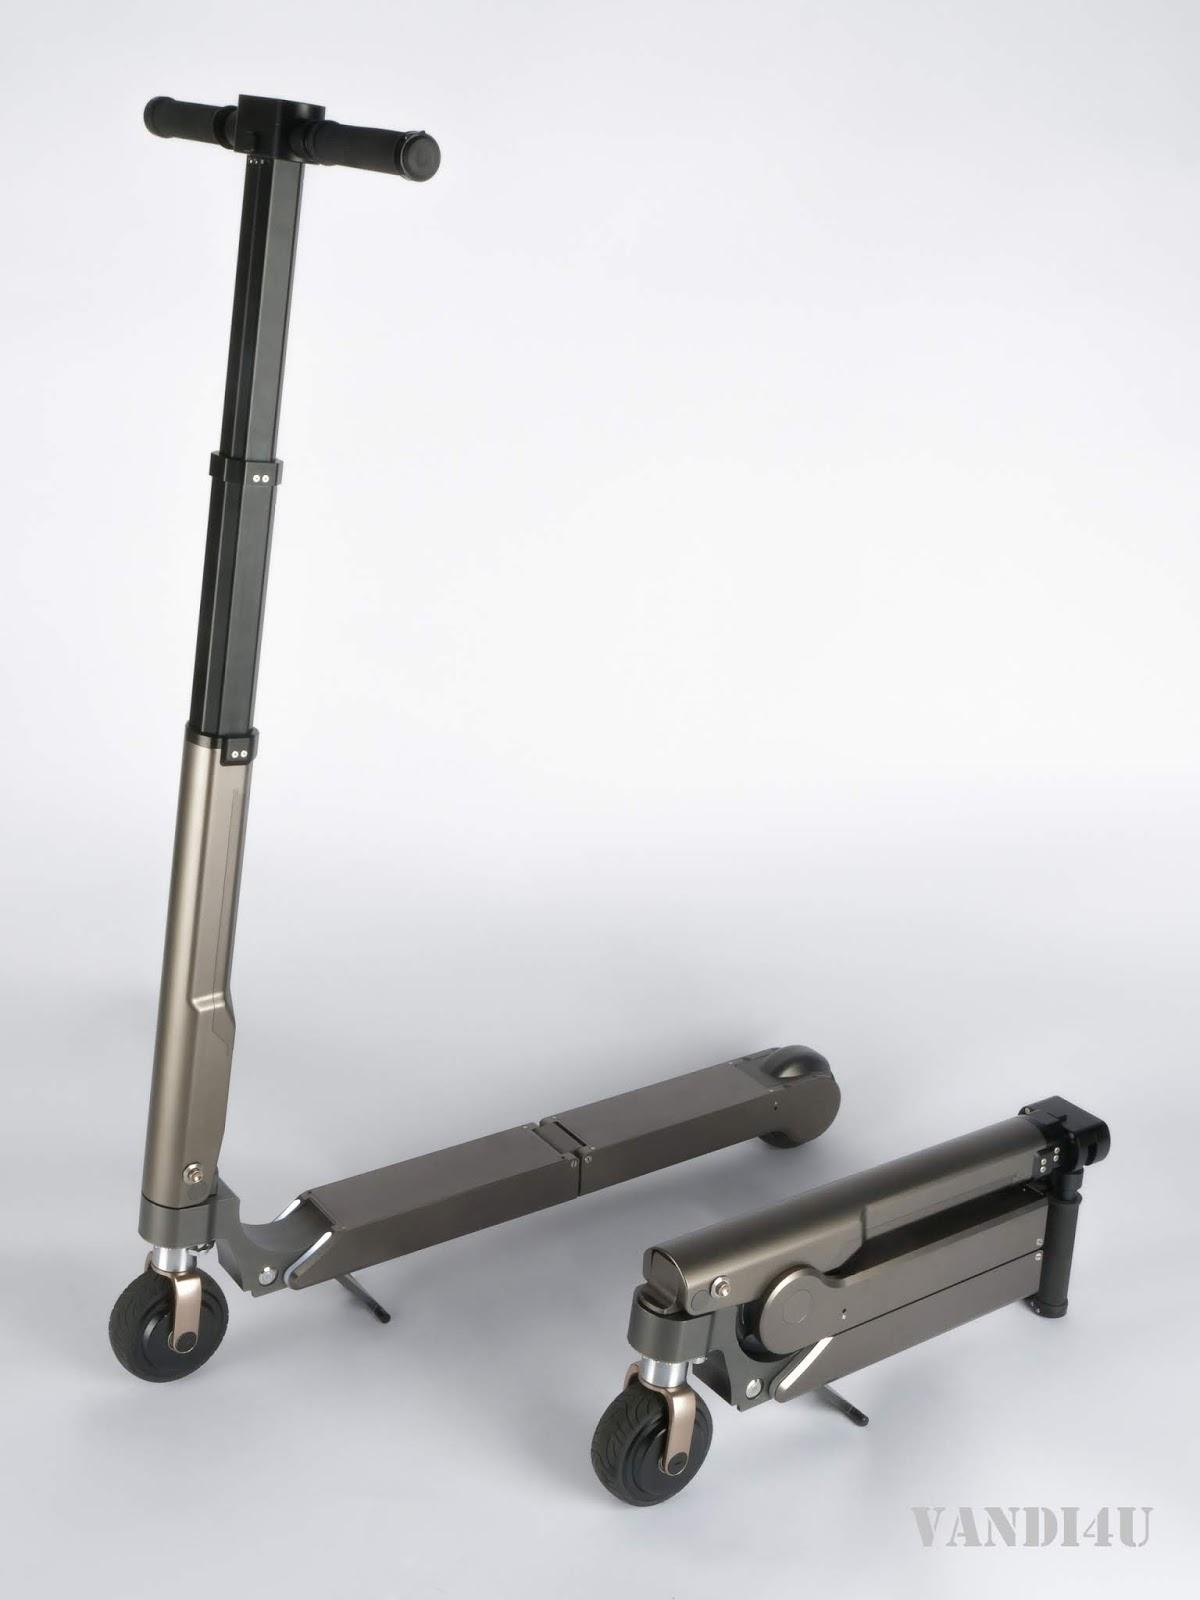 Soon Hyundai And Kia Models Will Get An Personal Electric Scooter   VANDI4U